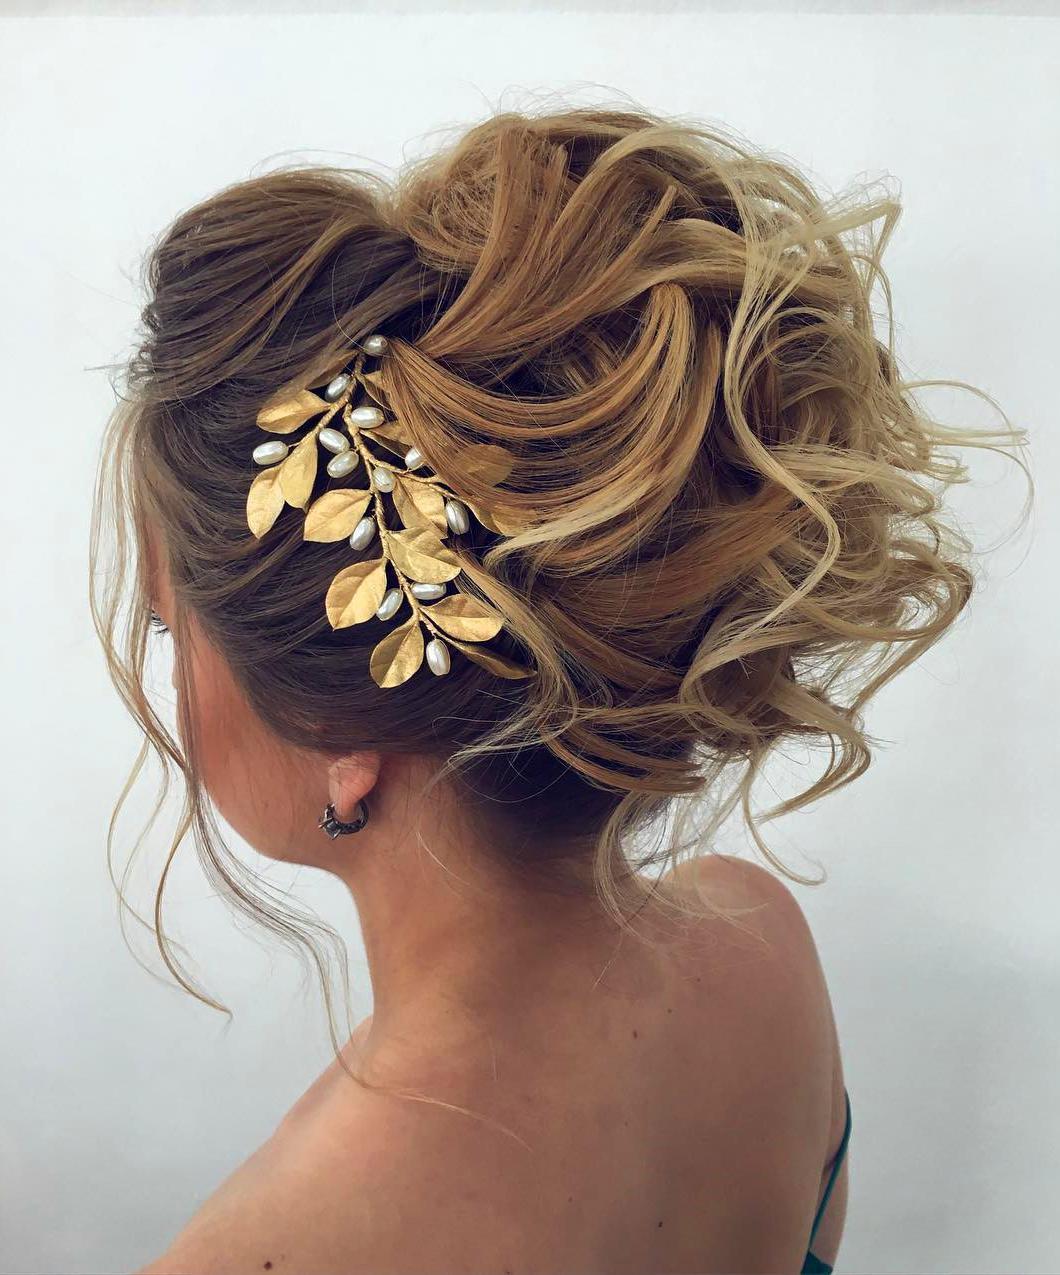 Wedding Hairstyles For Medium Length Hair #weddingforward #wedding #bride #weddinghair #summerweddinghairstyles #weddinghair #hairstyles #updo